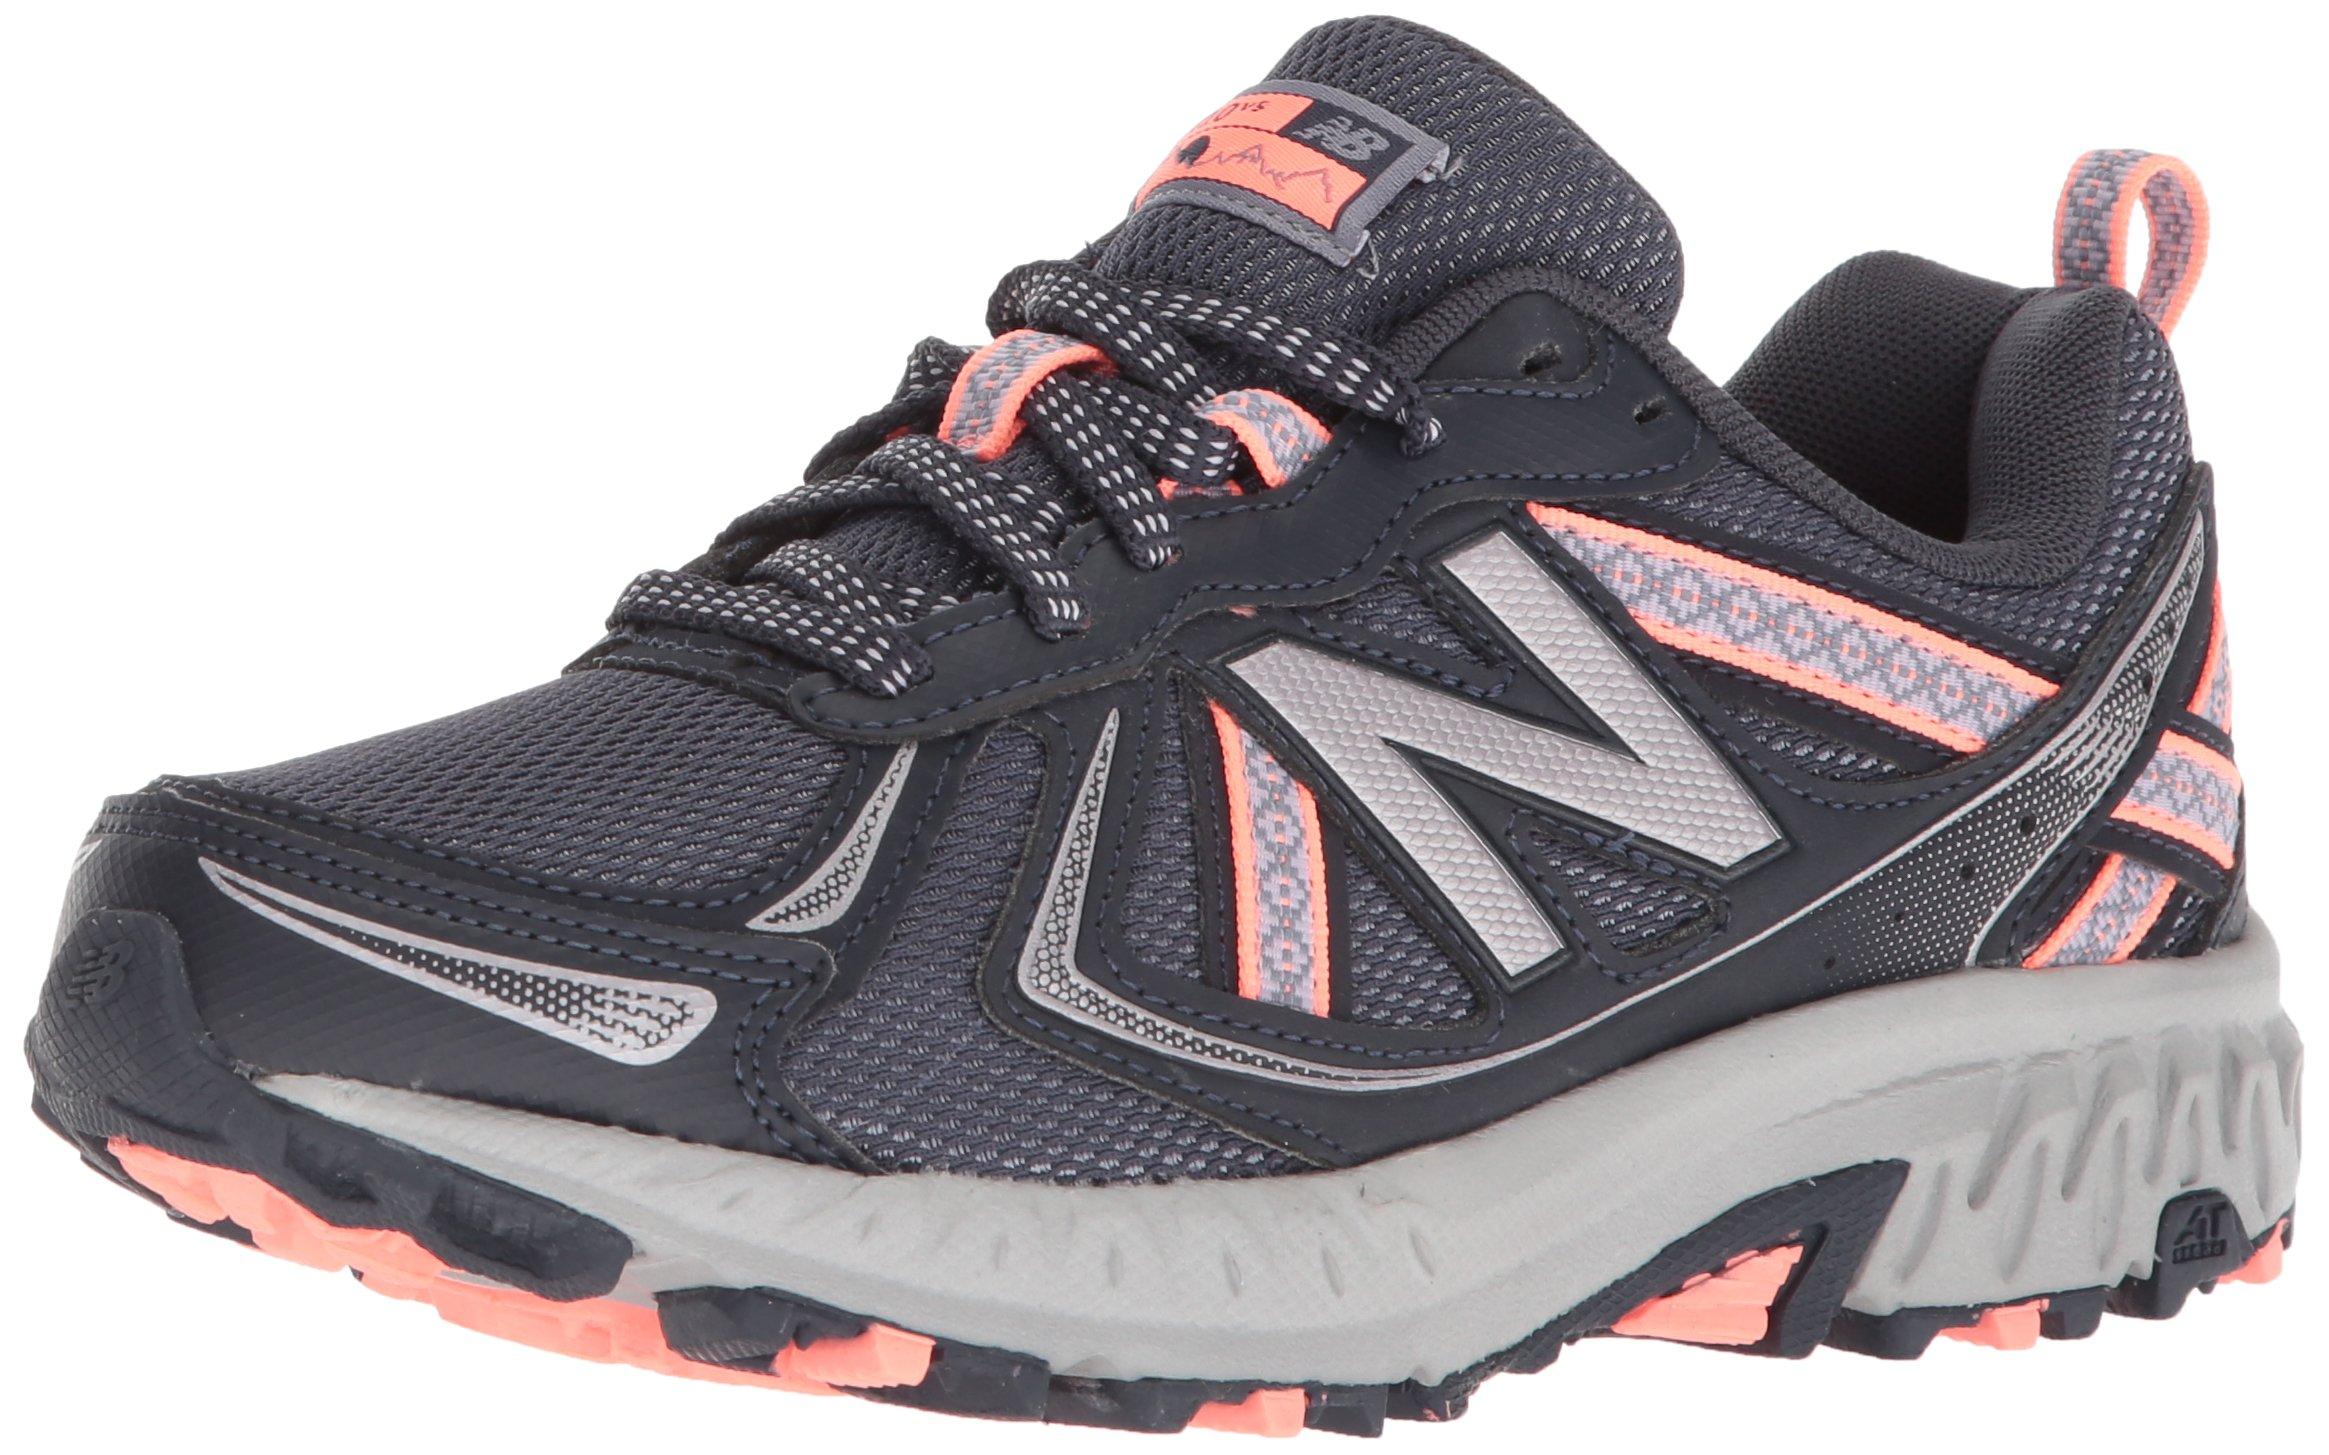 New Balance Women's WT410v5 Cushioning Trail Running Shoe, Thunder, 5.5 D US by New Balance